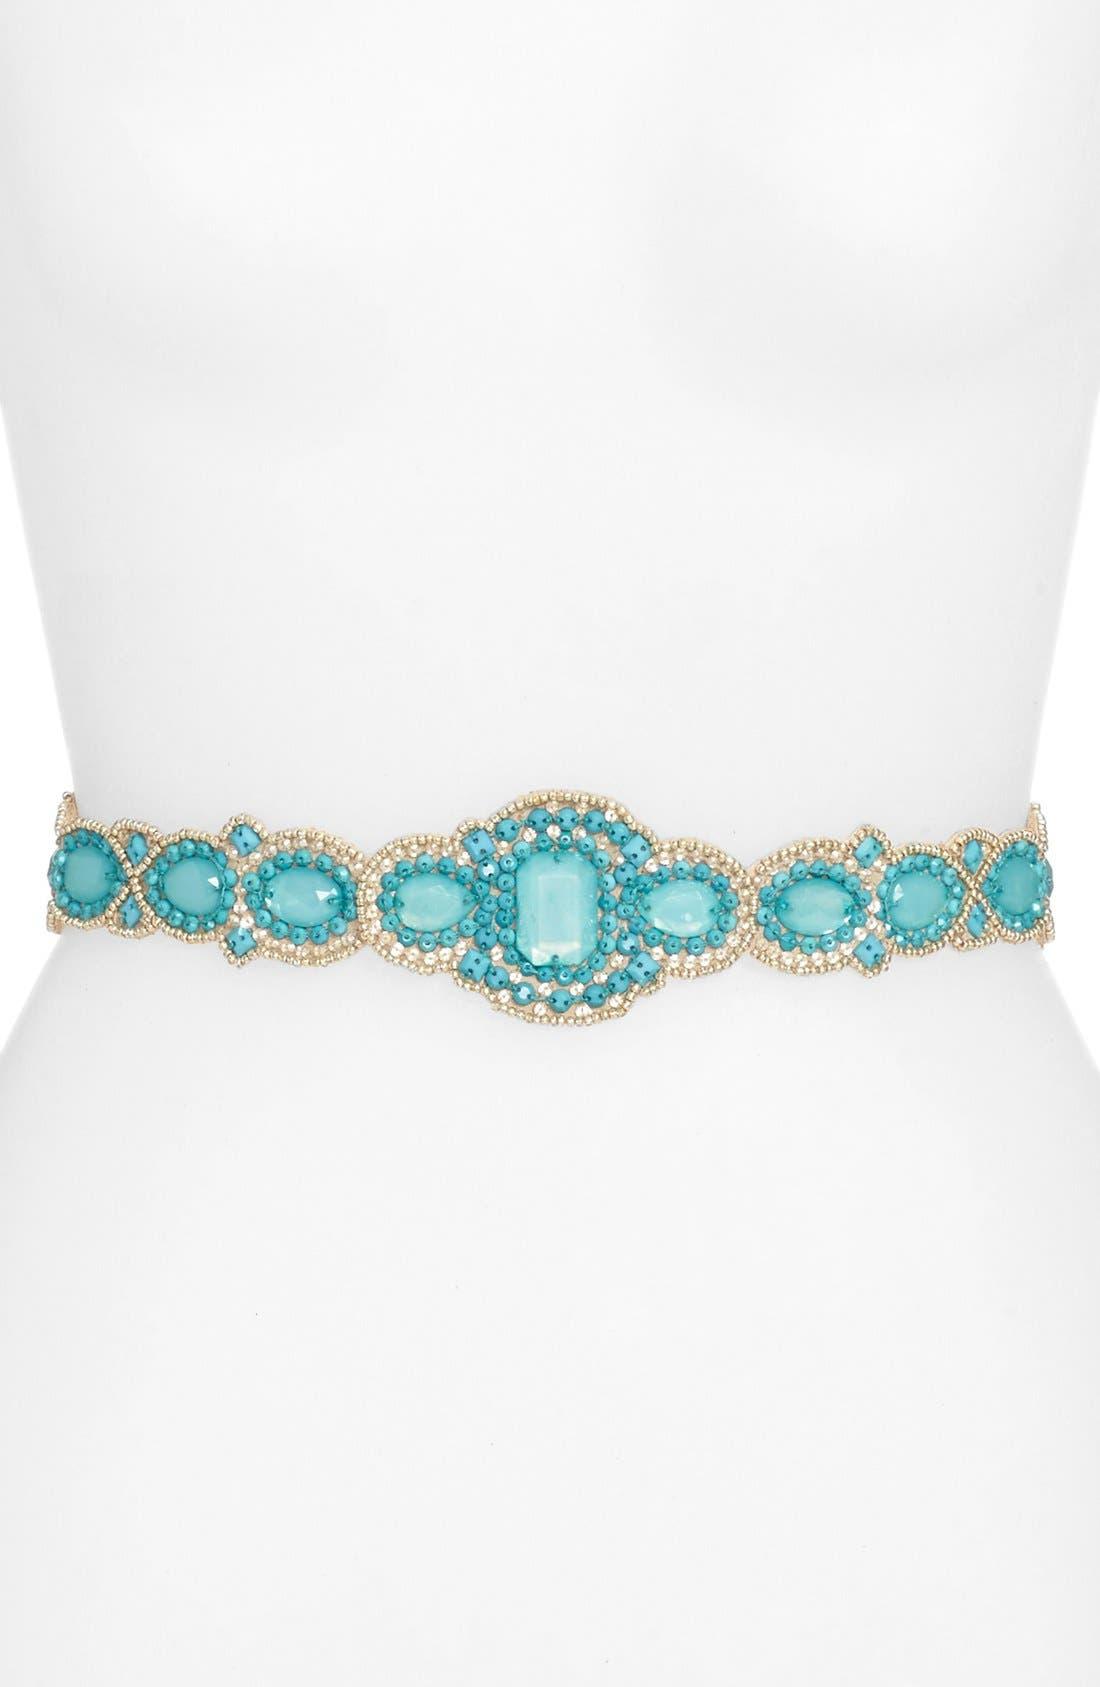 Main Image - Glint 'Casablanca' Beaded Stretch Belt